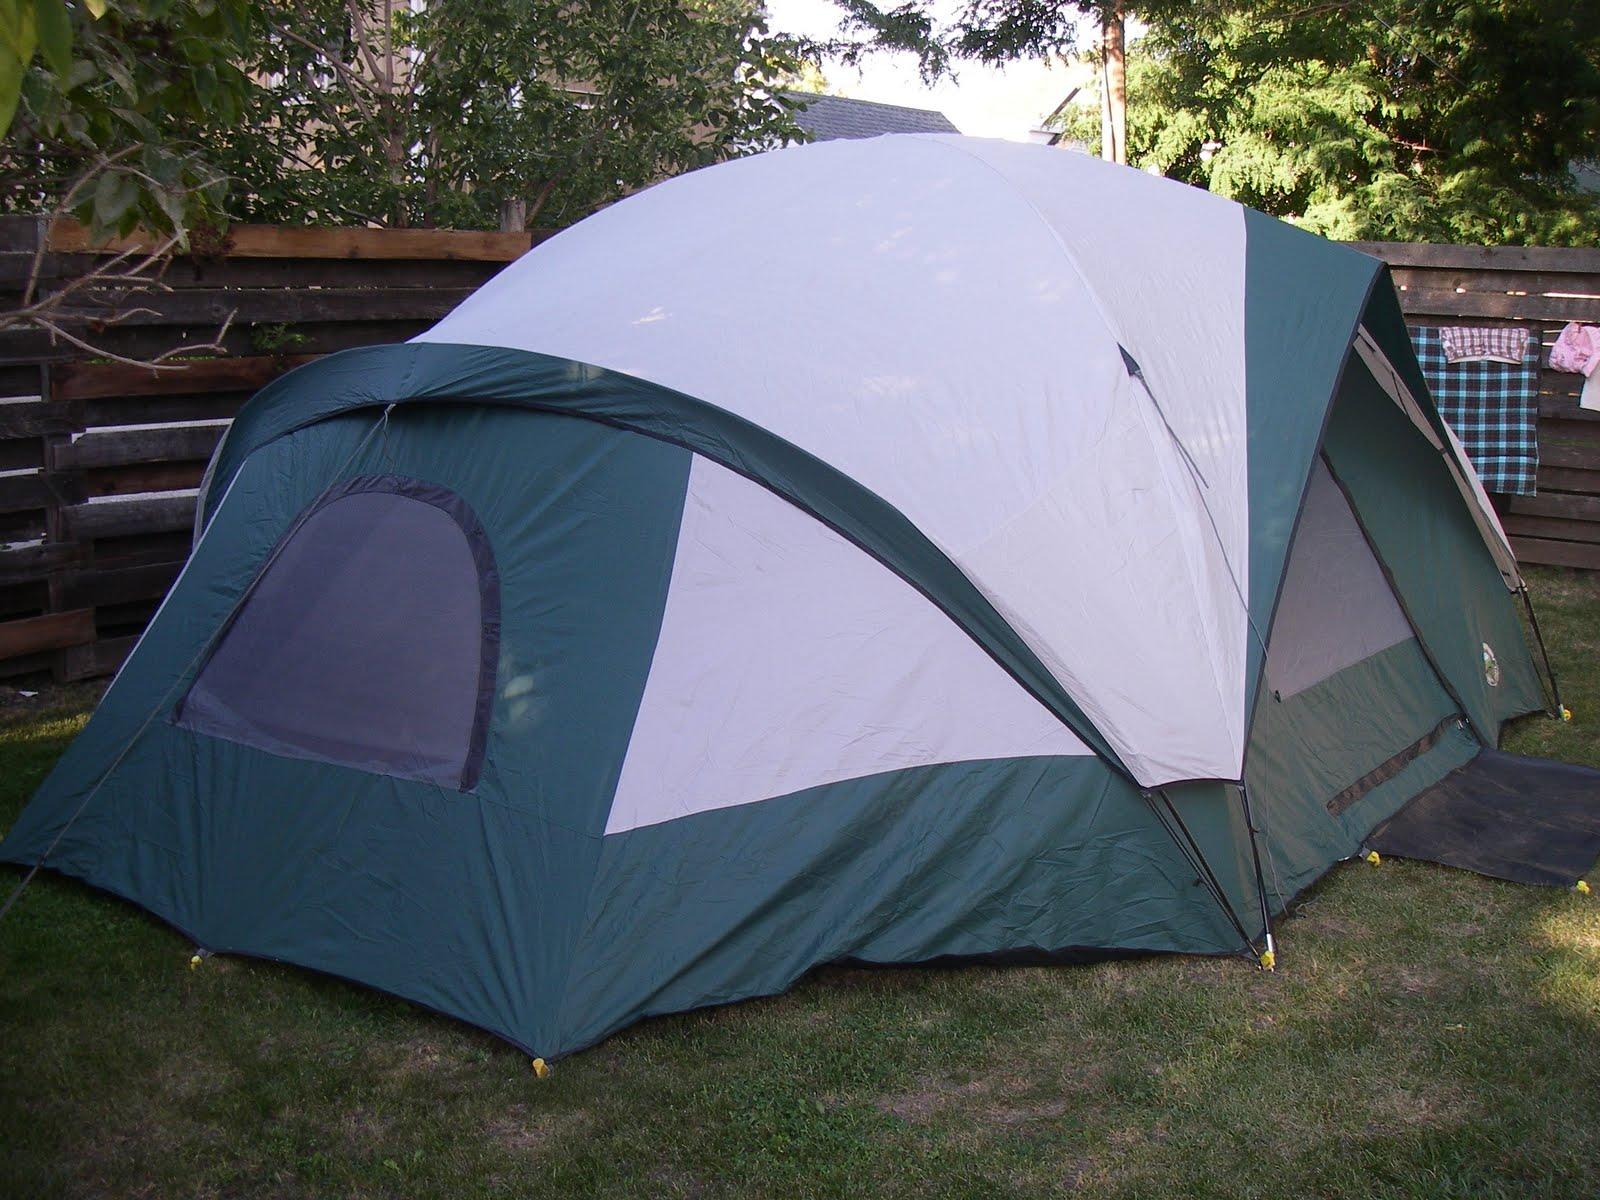 Ozark Trail // 20u0027 x 13u0027 // 9-10 Person Tent & May The Forest Be With You: Ozark Trail // 20u0027 x 13u0027 // 9-10 ...